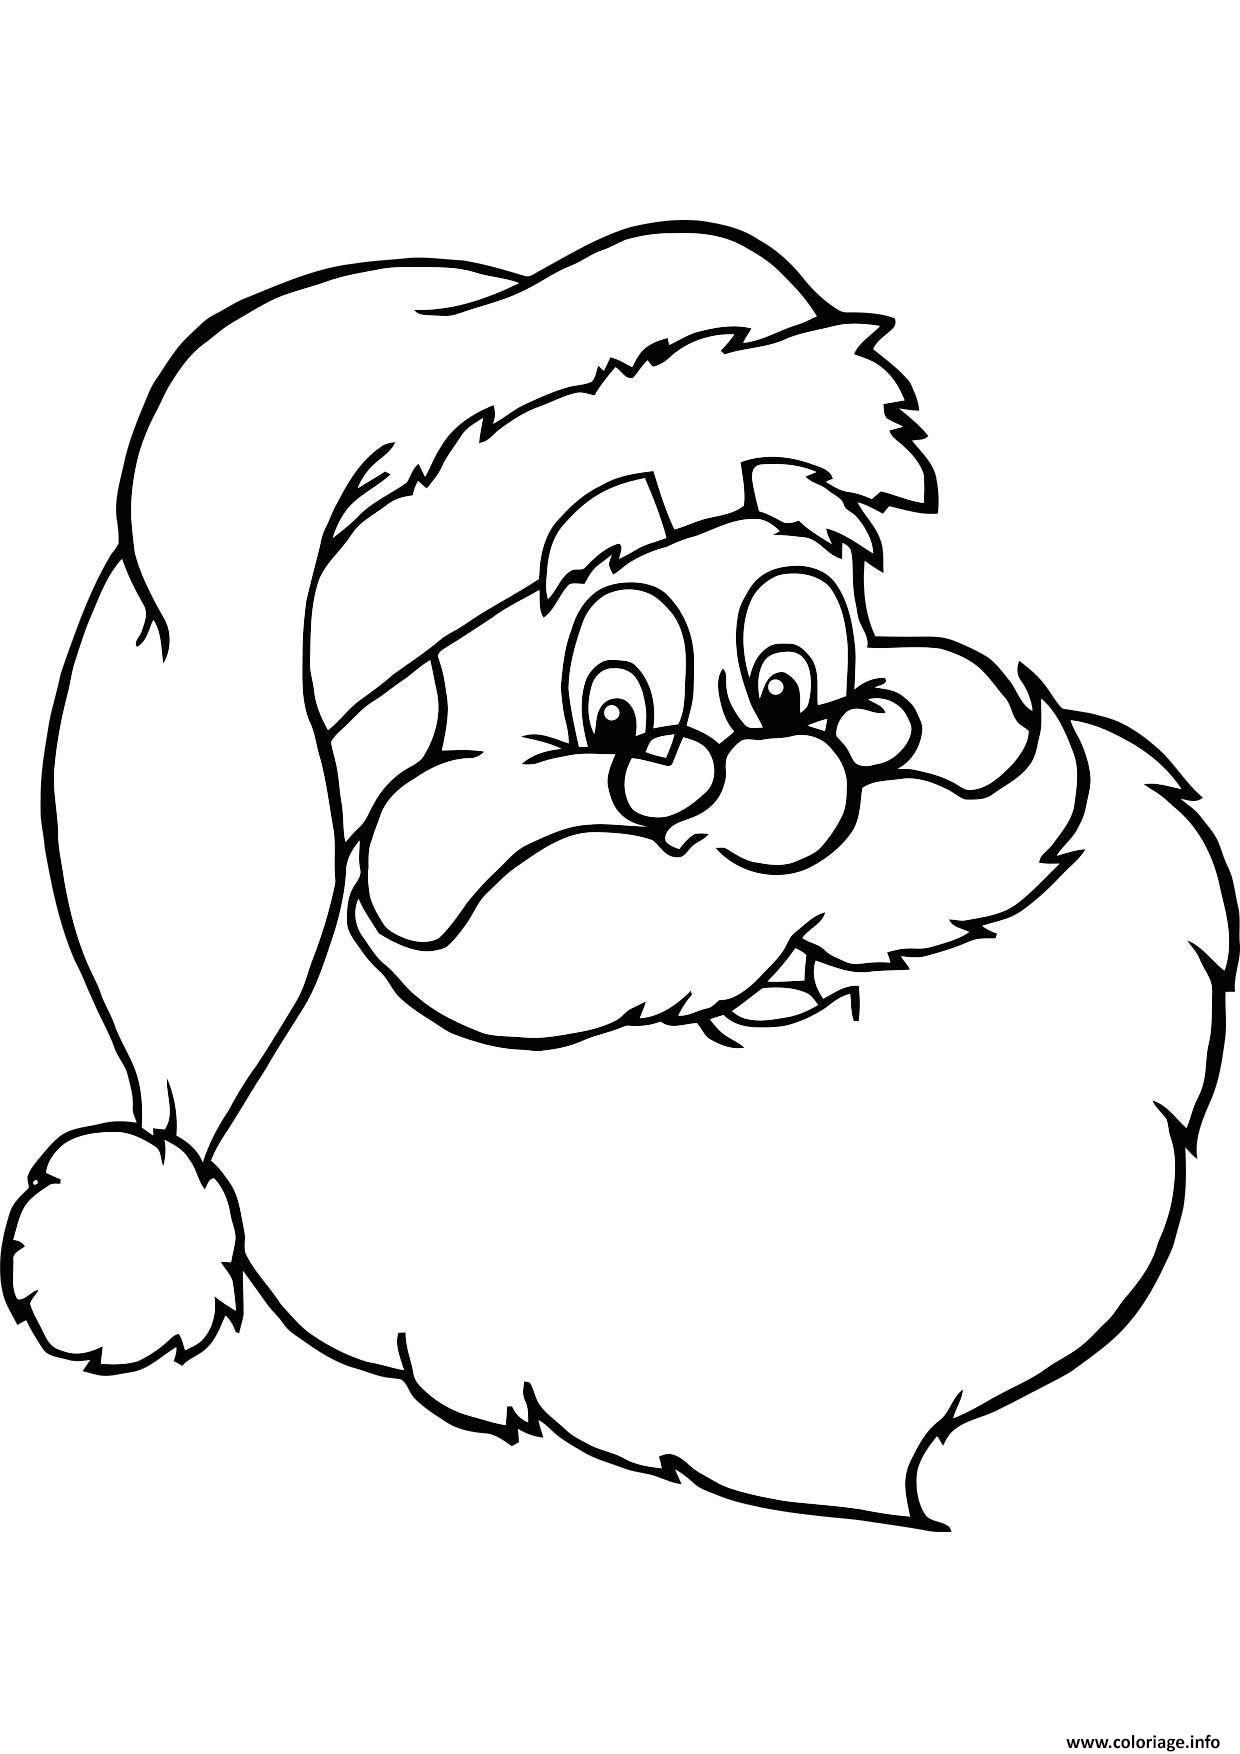 Coloriage Gulli Noel Le Portait Du Pere Noel dessin